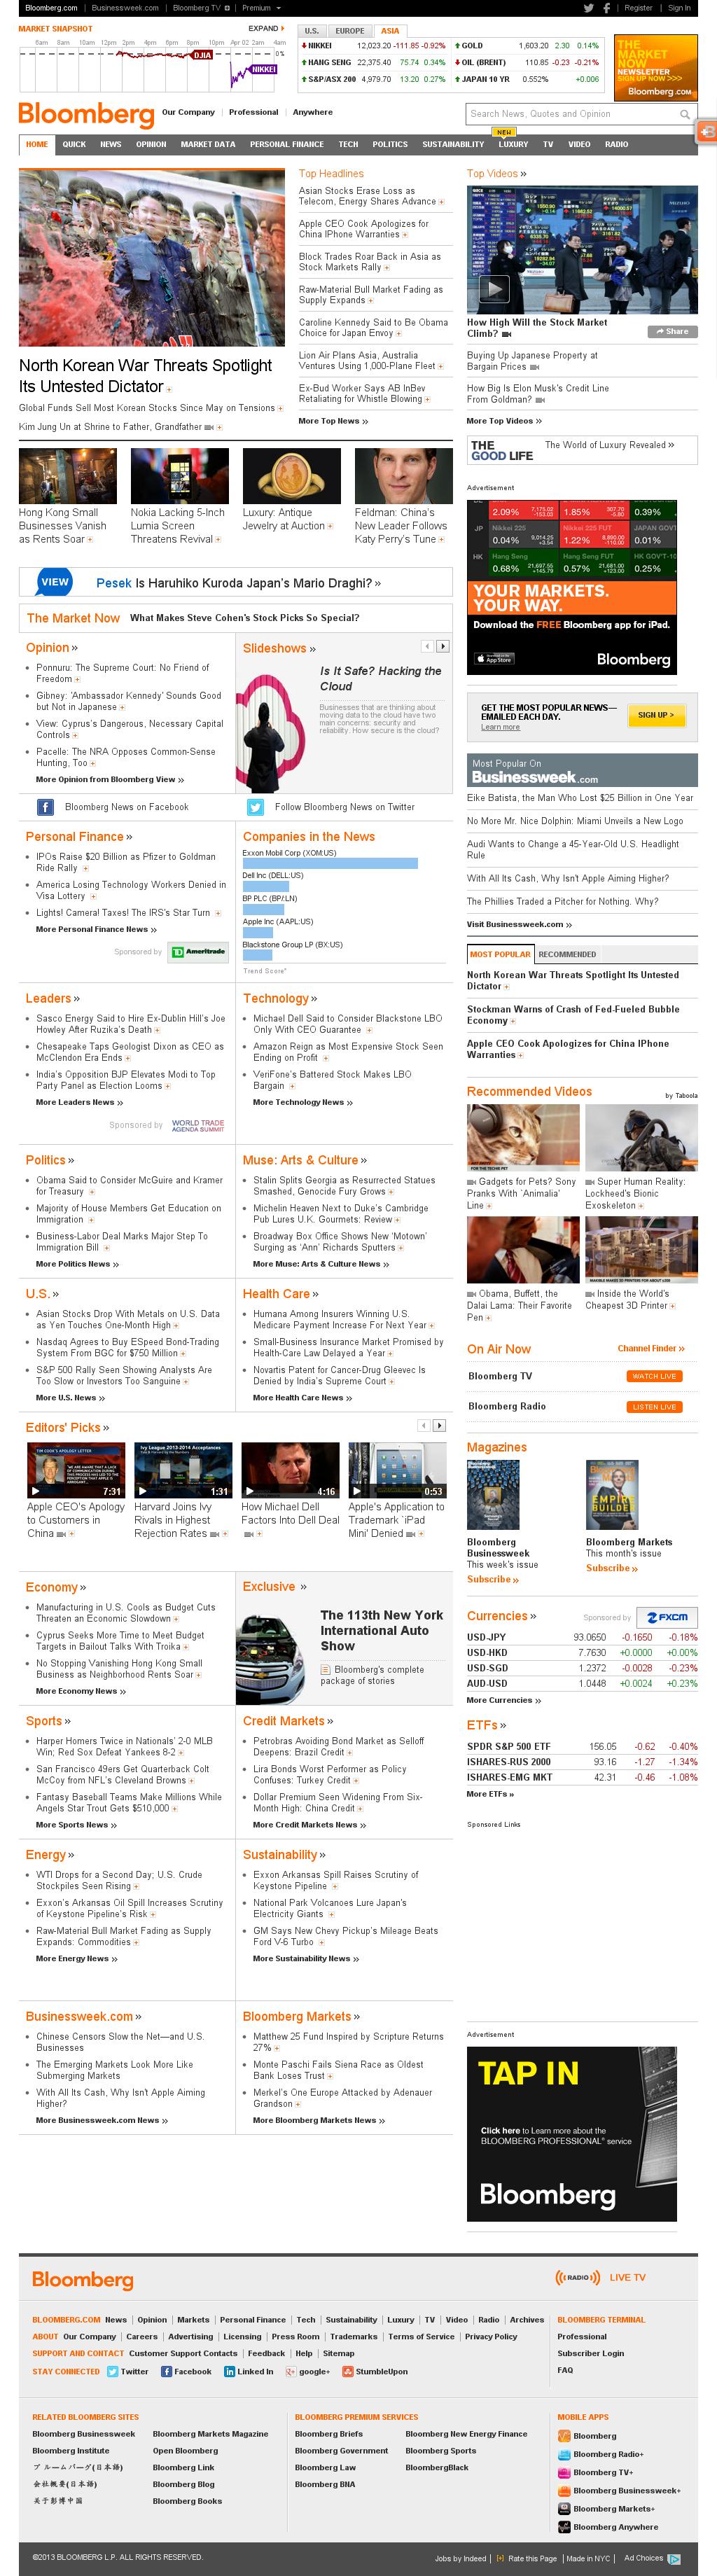 Bloomberg at Tuesday April 2, 2013, 2:01 a.m. UTC